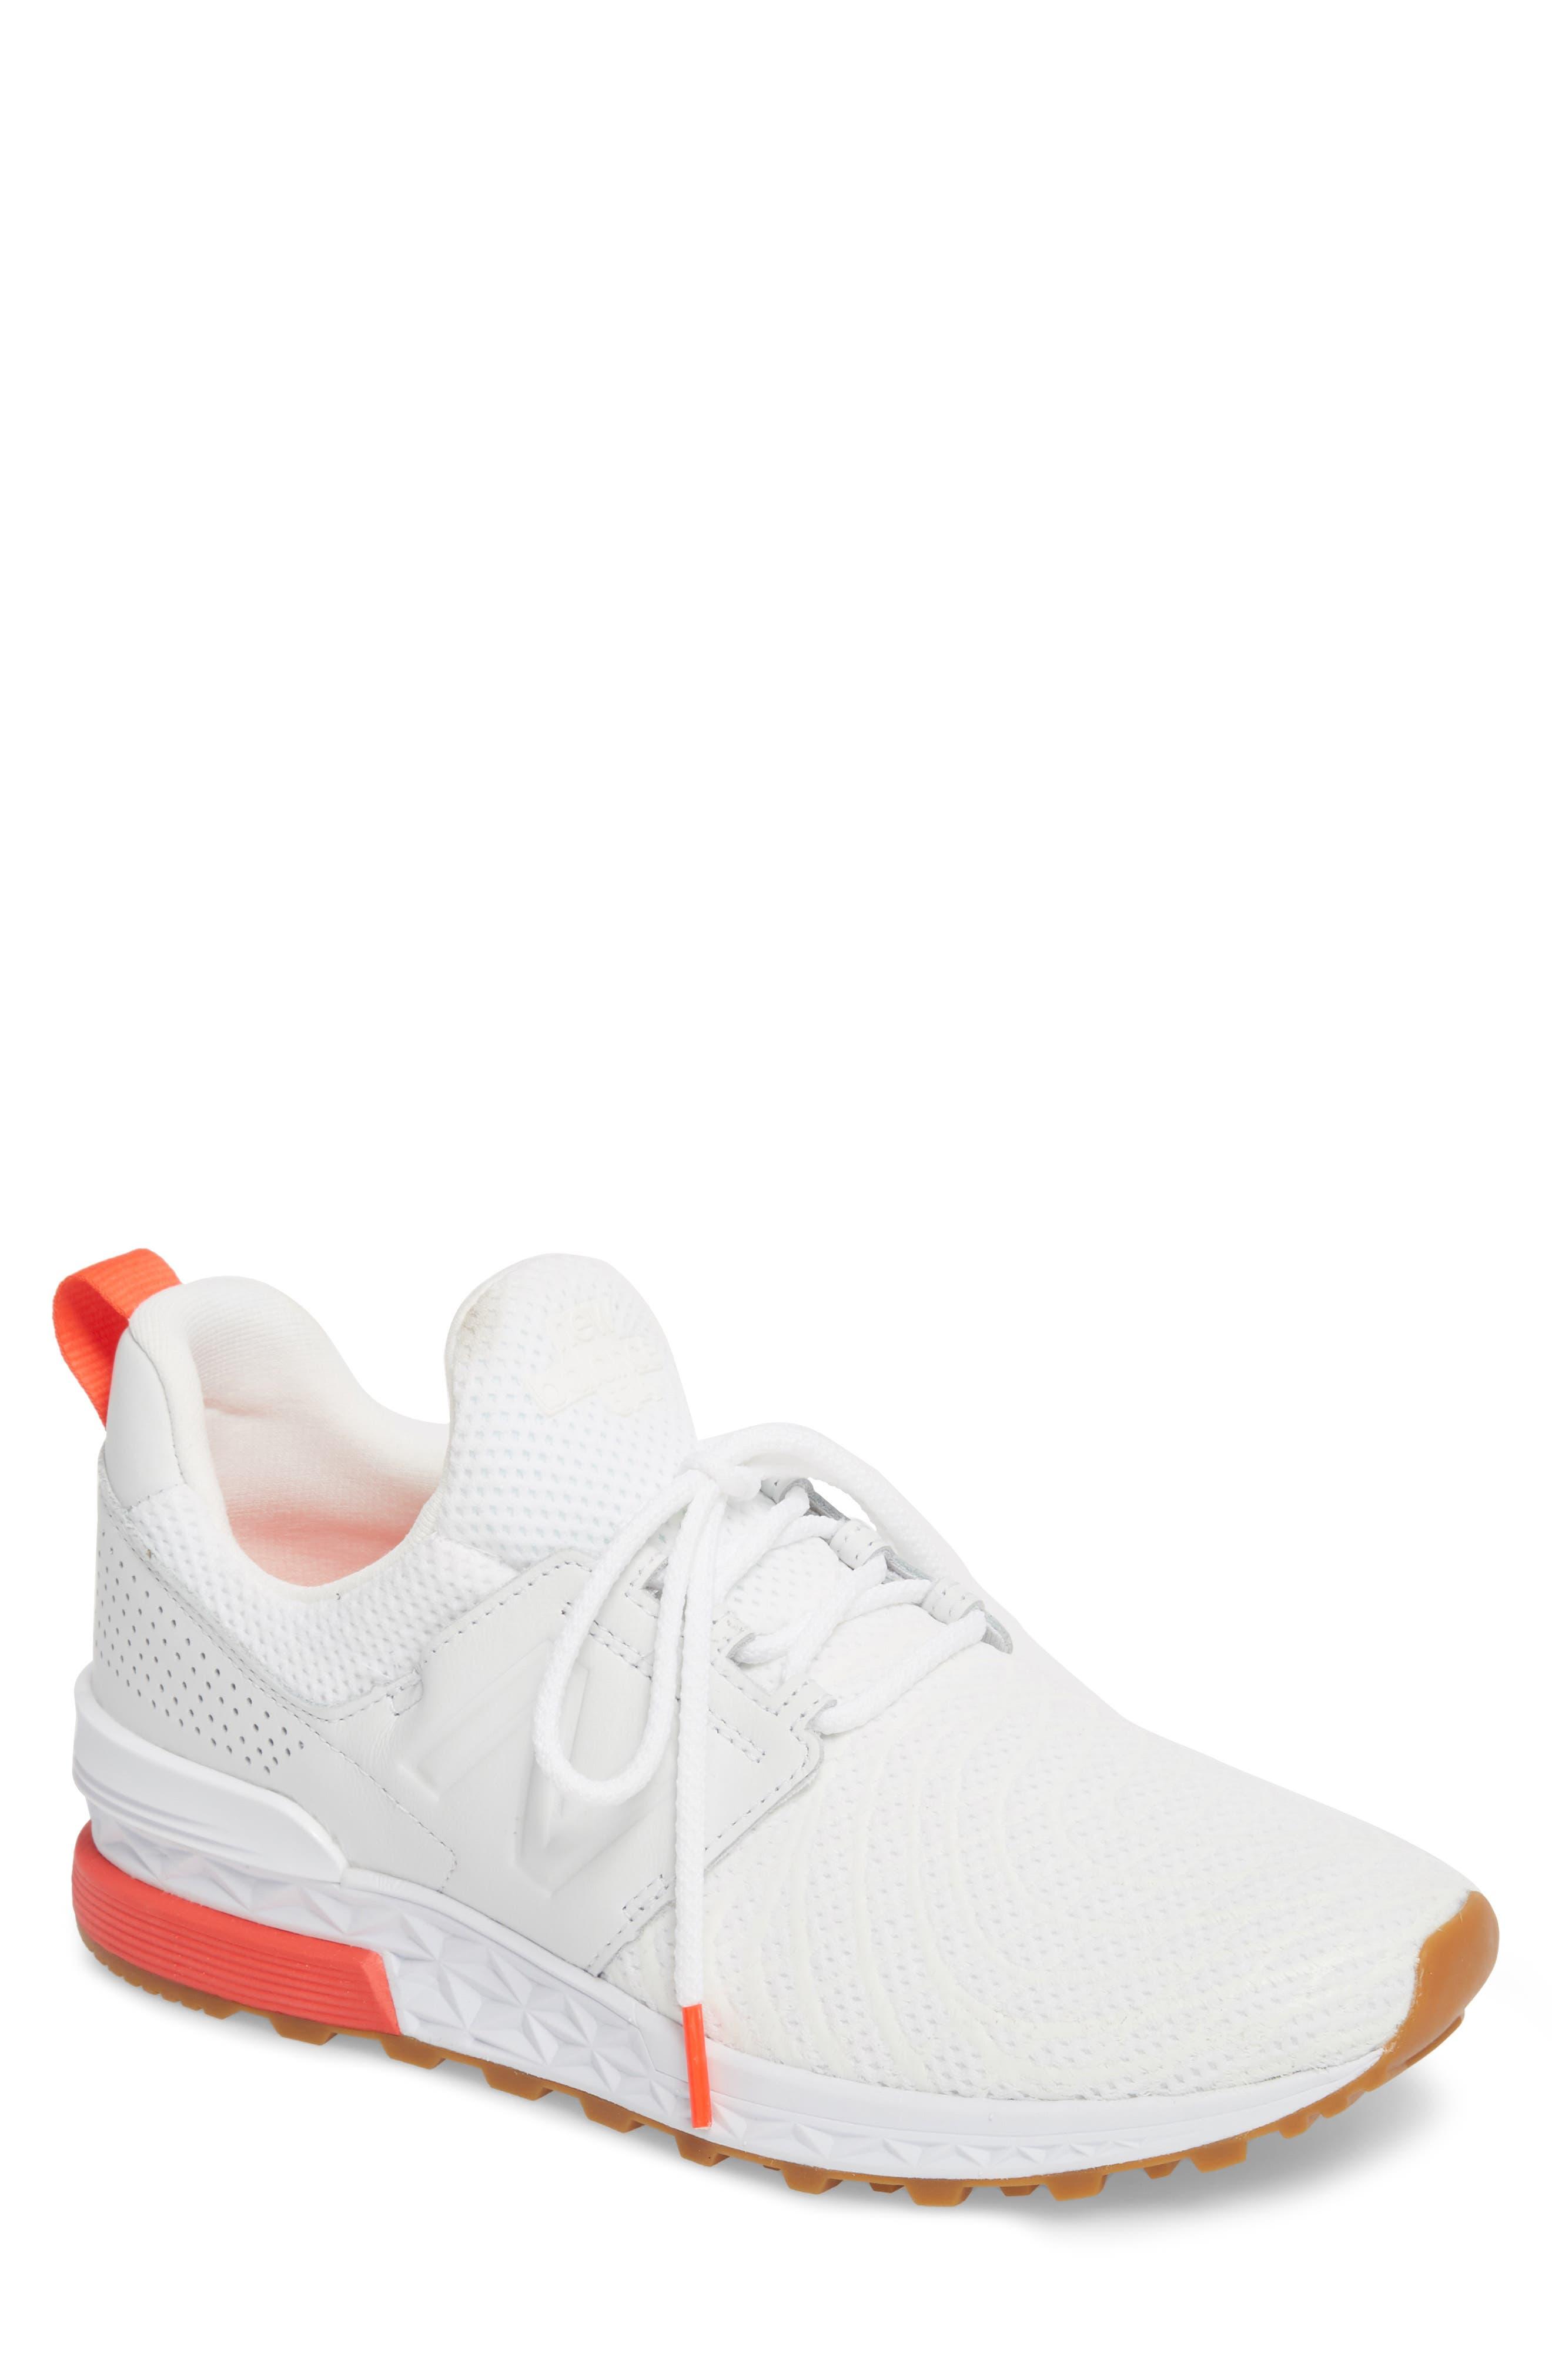 574 Sport Sneaker,                             Main thumbnail 1, color,                             100